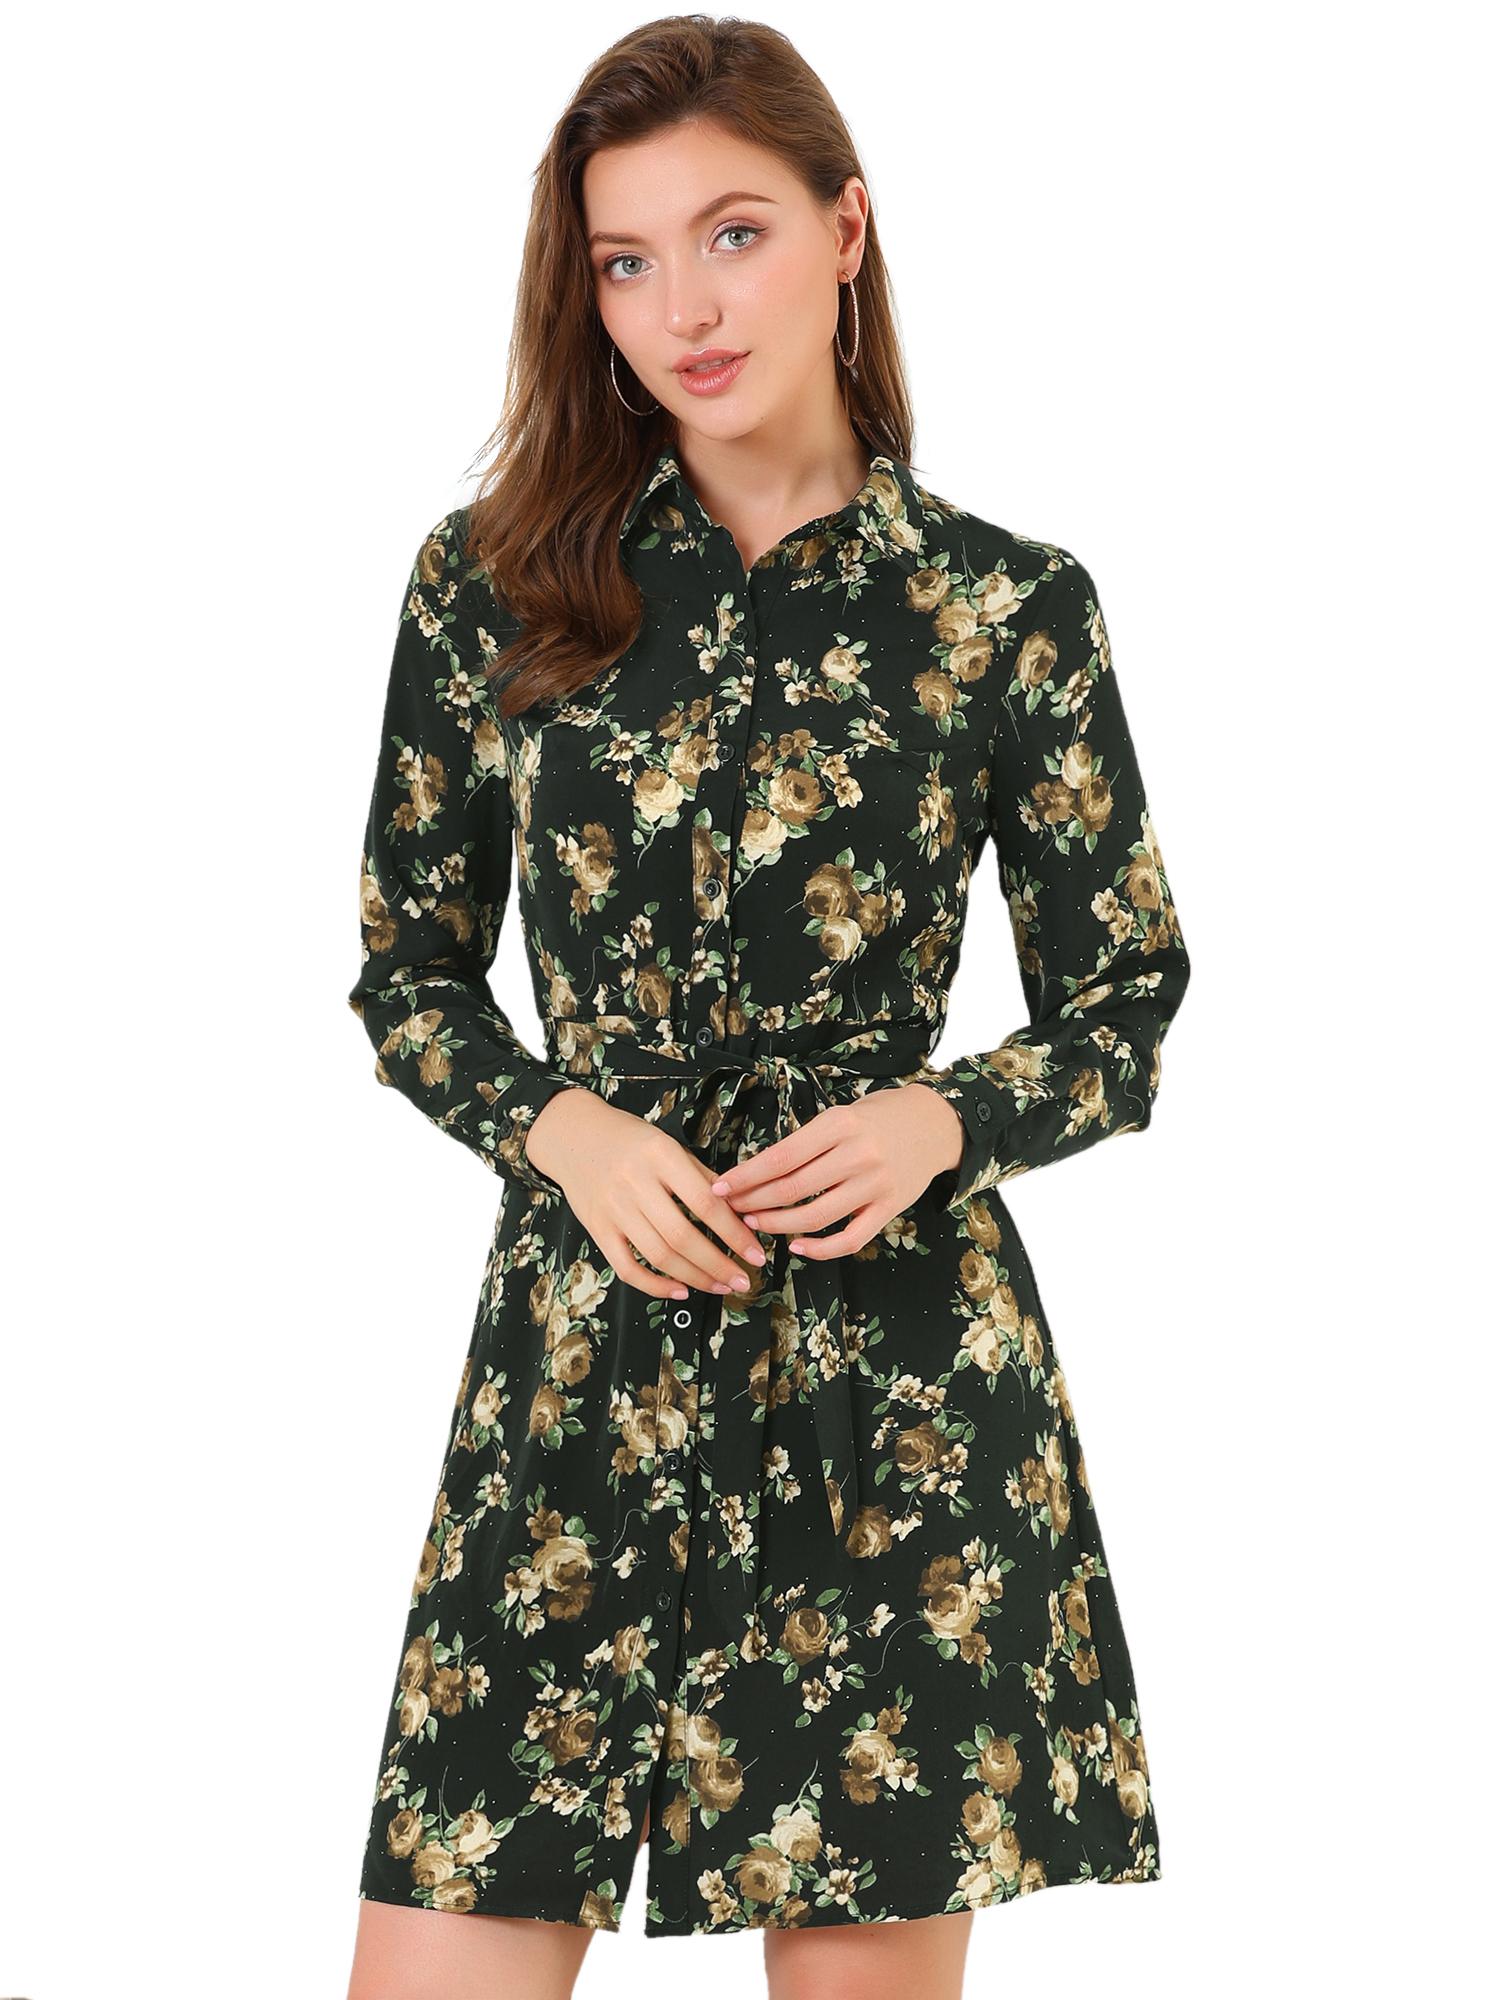 Allegra K Women's Button Down Polka Dots Floral Shirt Dress Black XS